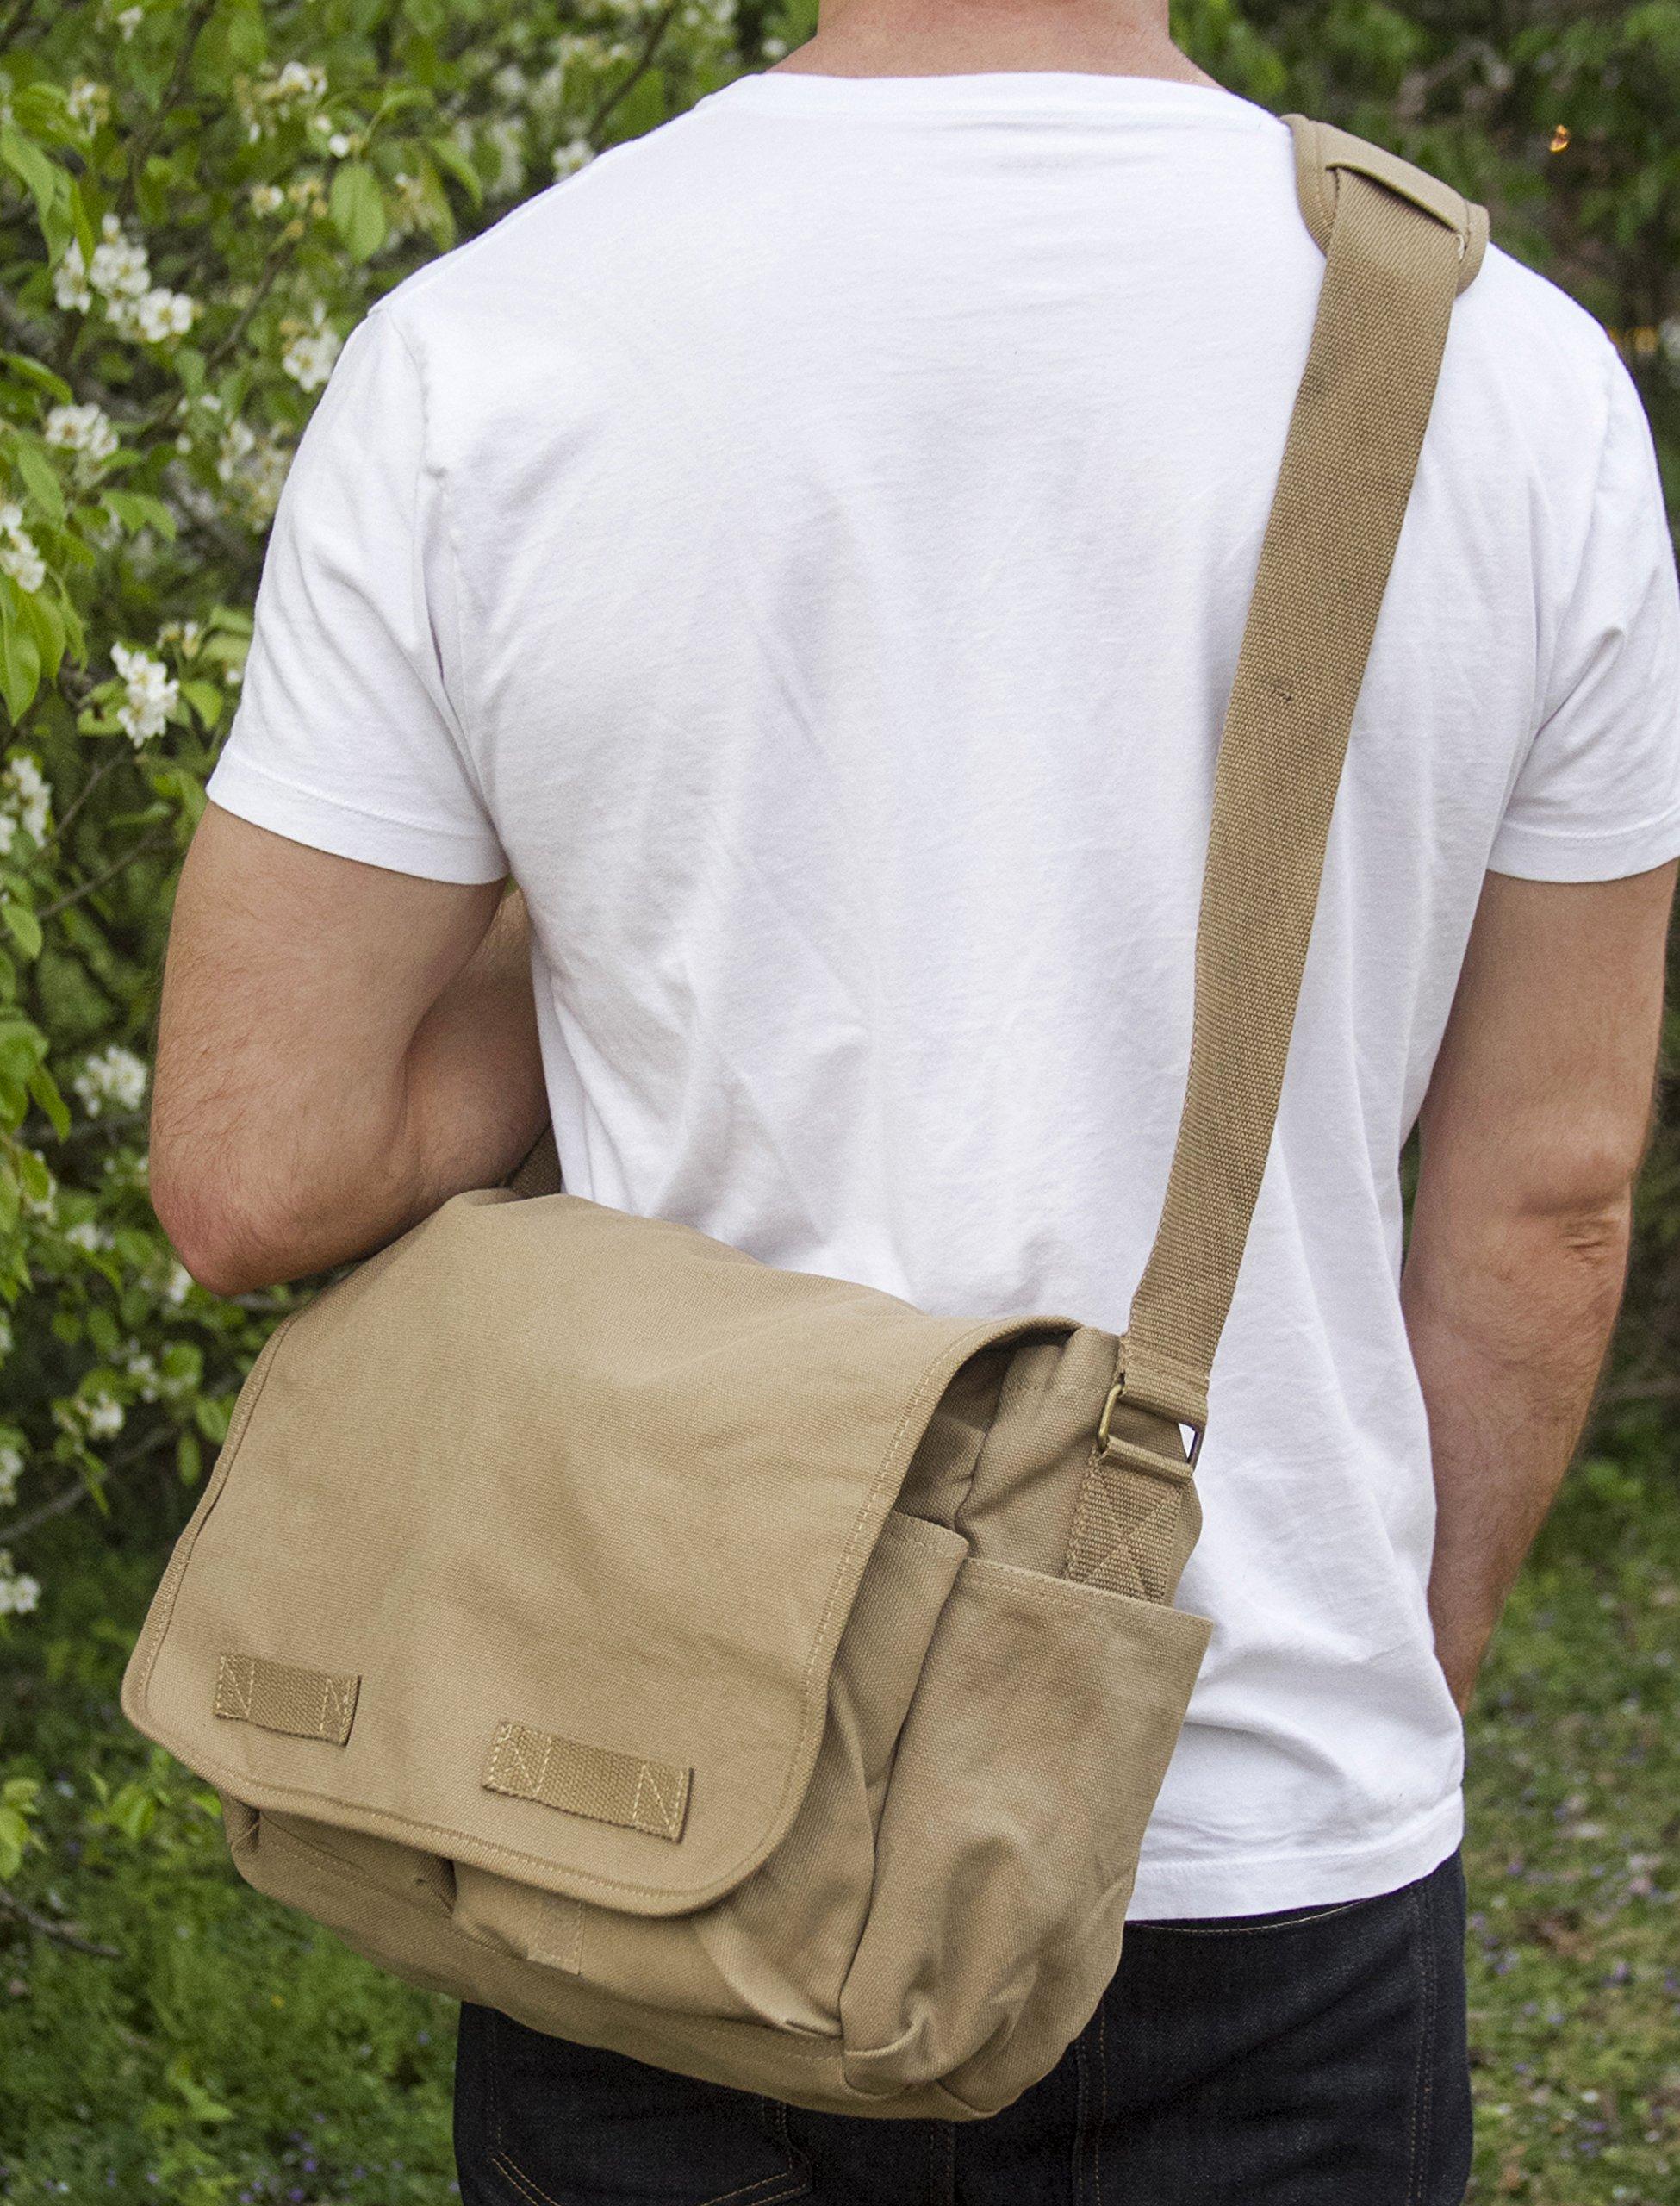 788c7cd64818 ایگرد - خرید از آمازون | Sweetbriar Classic Messenger Bag - Vintage ...